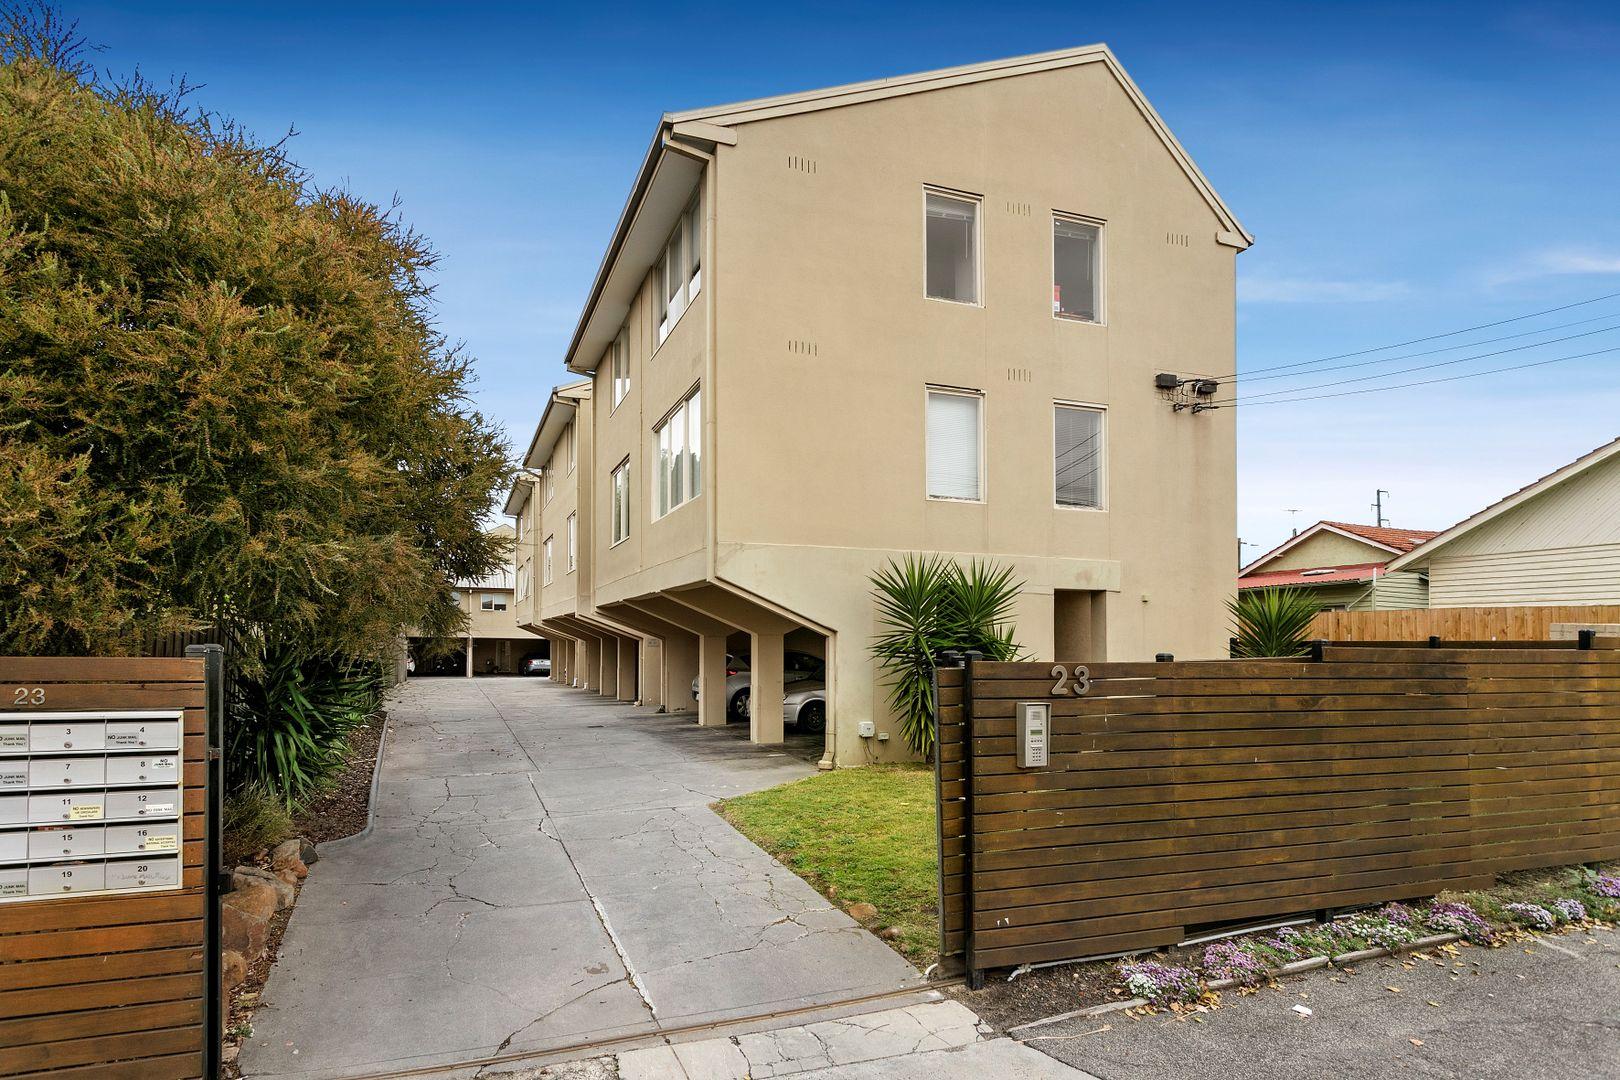 11/23 Baxter Street, Coburg VIC 3058, Image 0